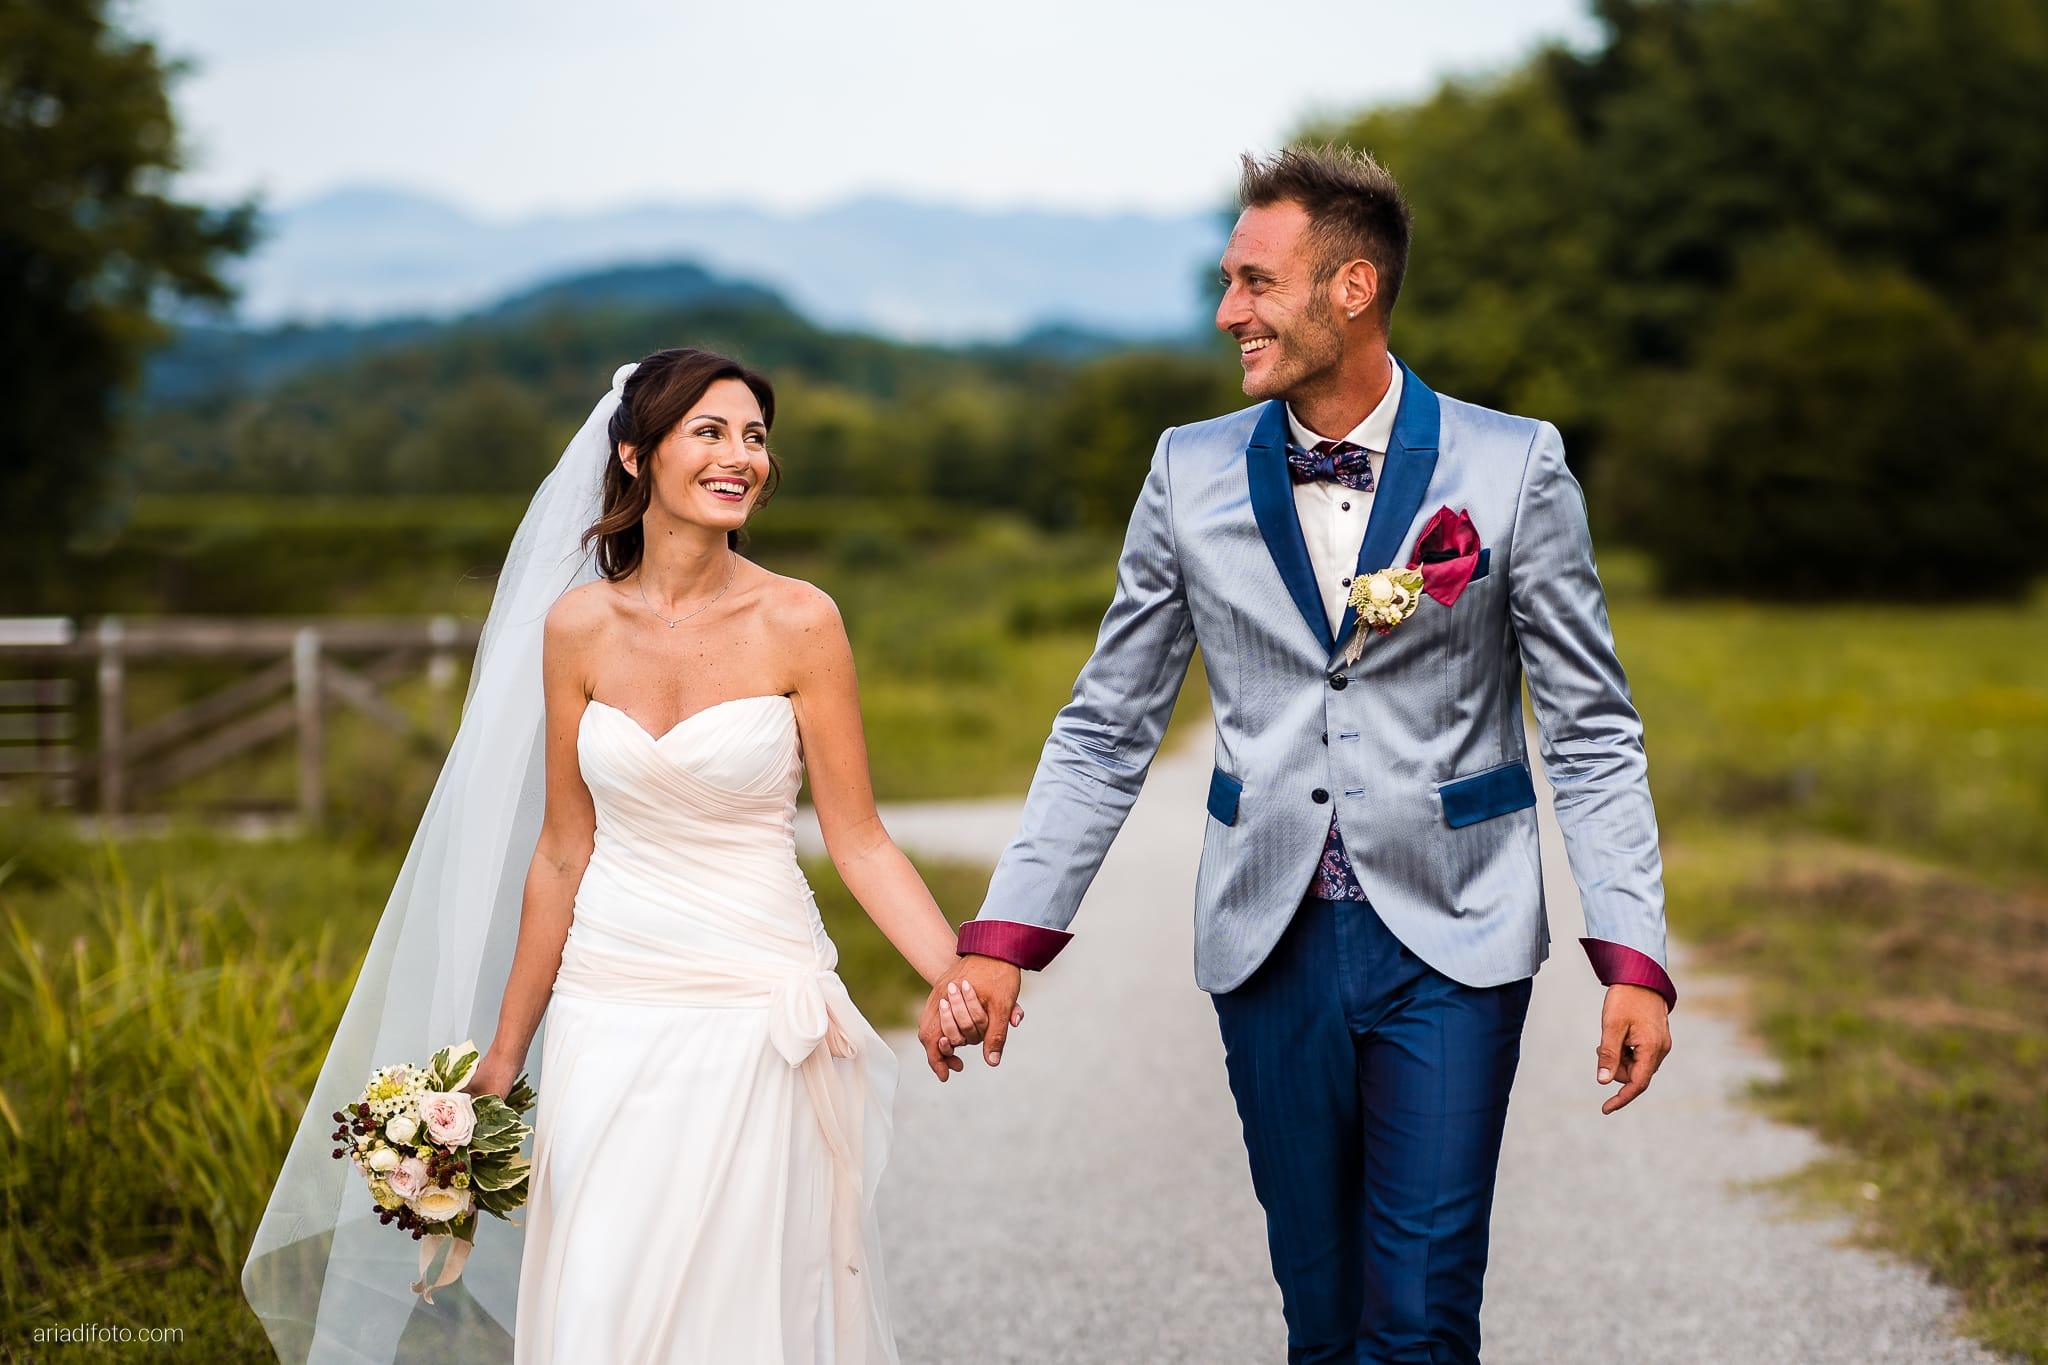 Stefania Raffaele Matrimonio Country Chic Outdoor Gorizia ritratti sposi